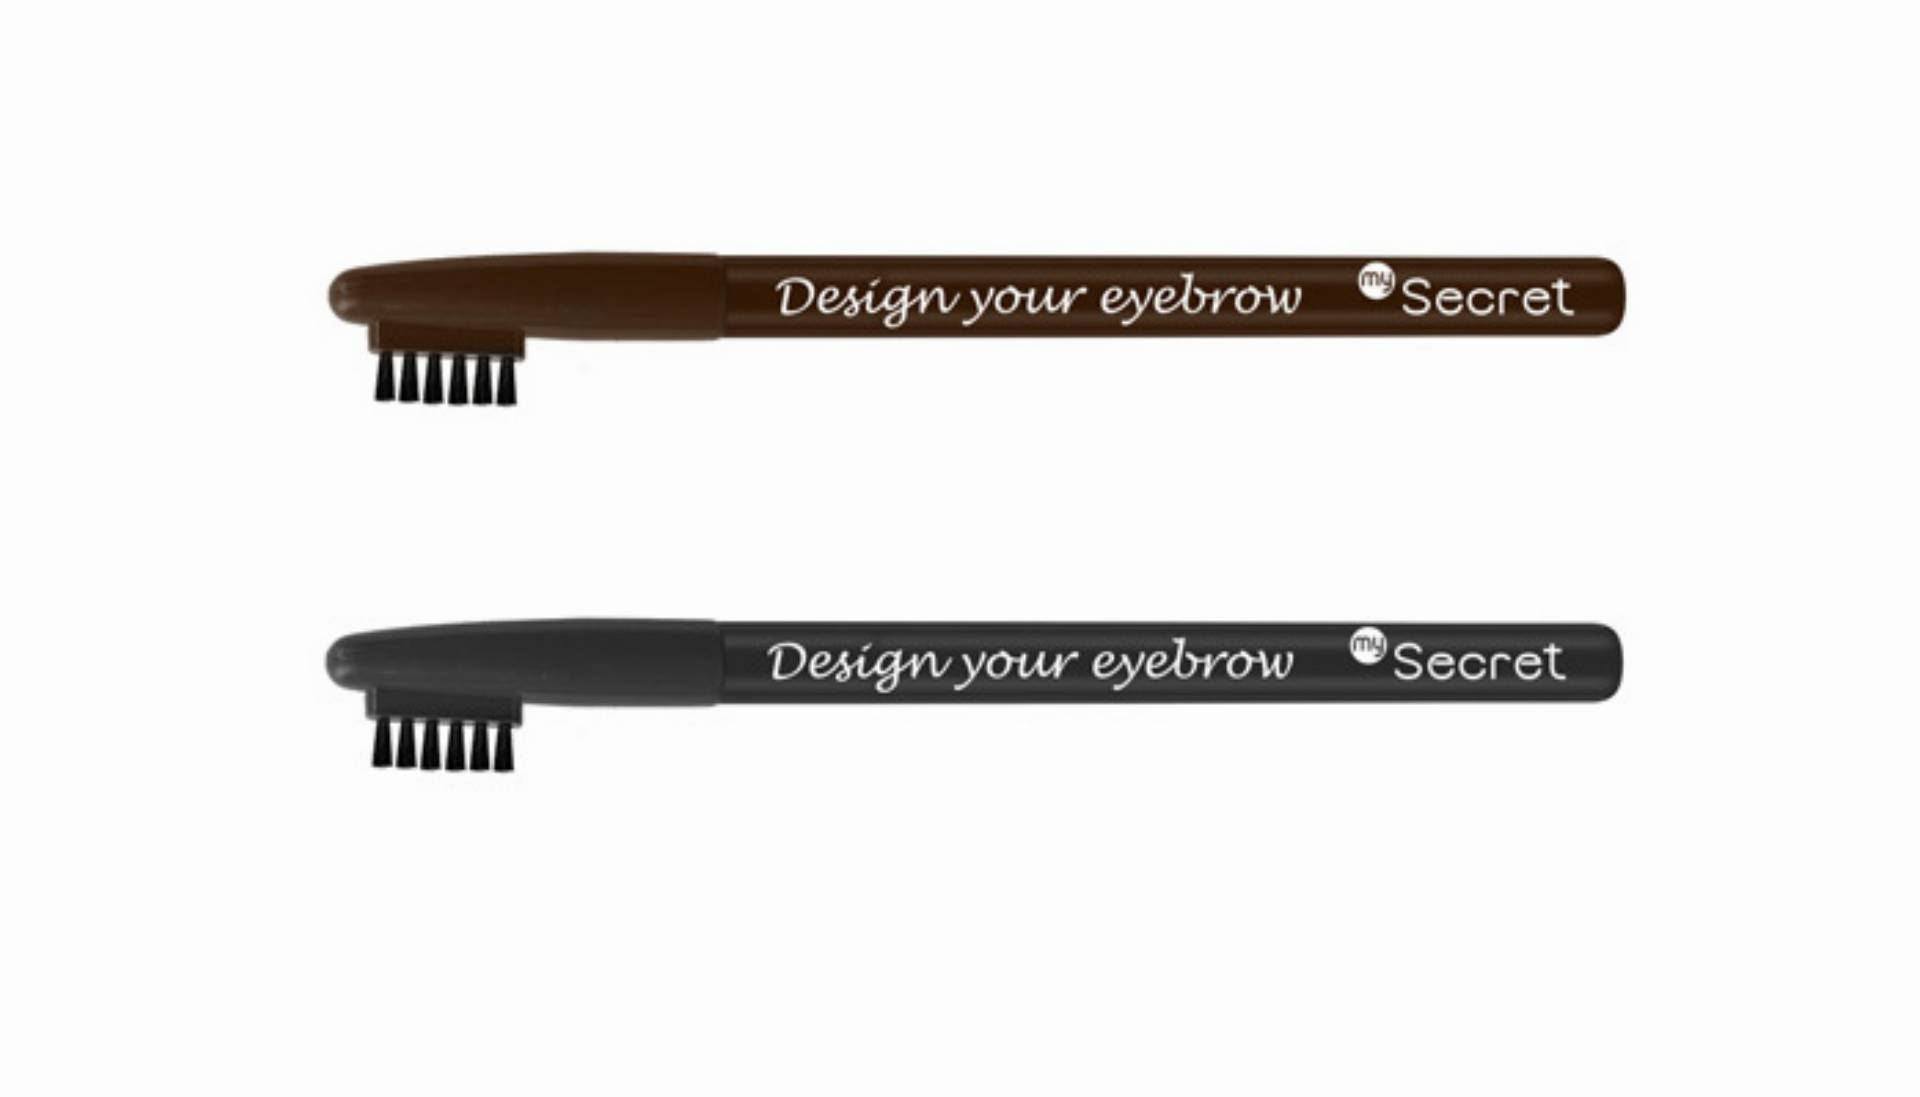 DESIGN YOUR EYEBROW